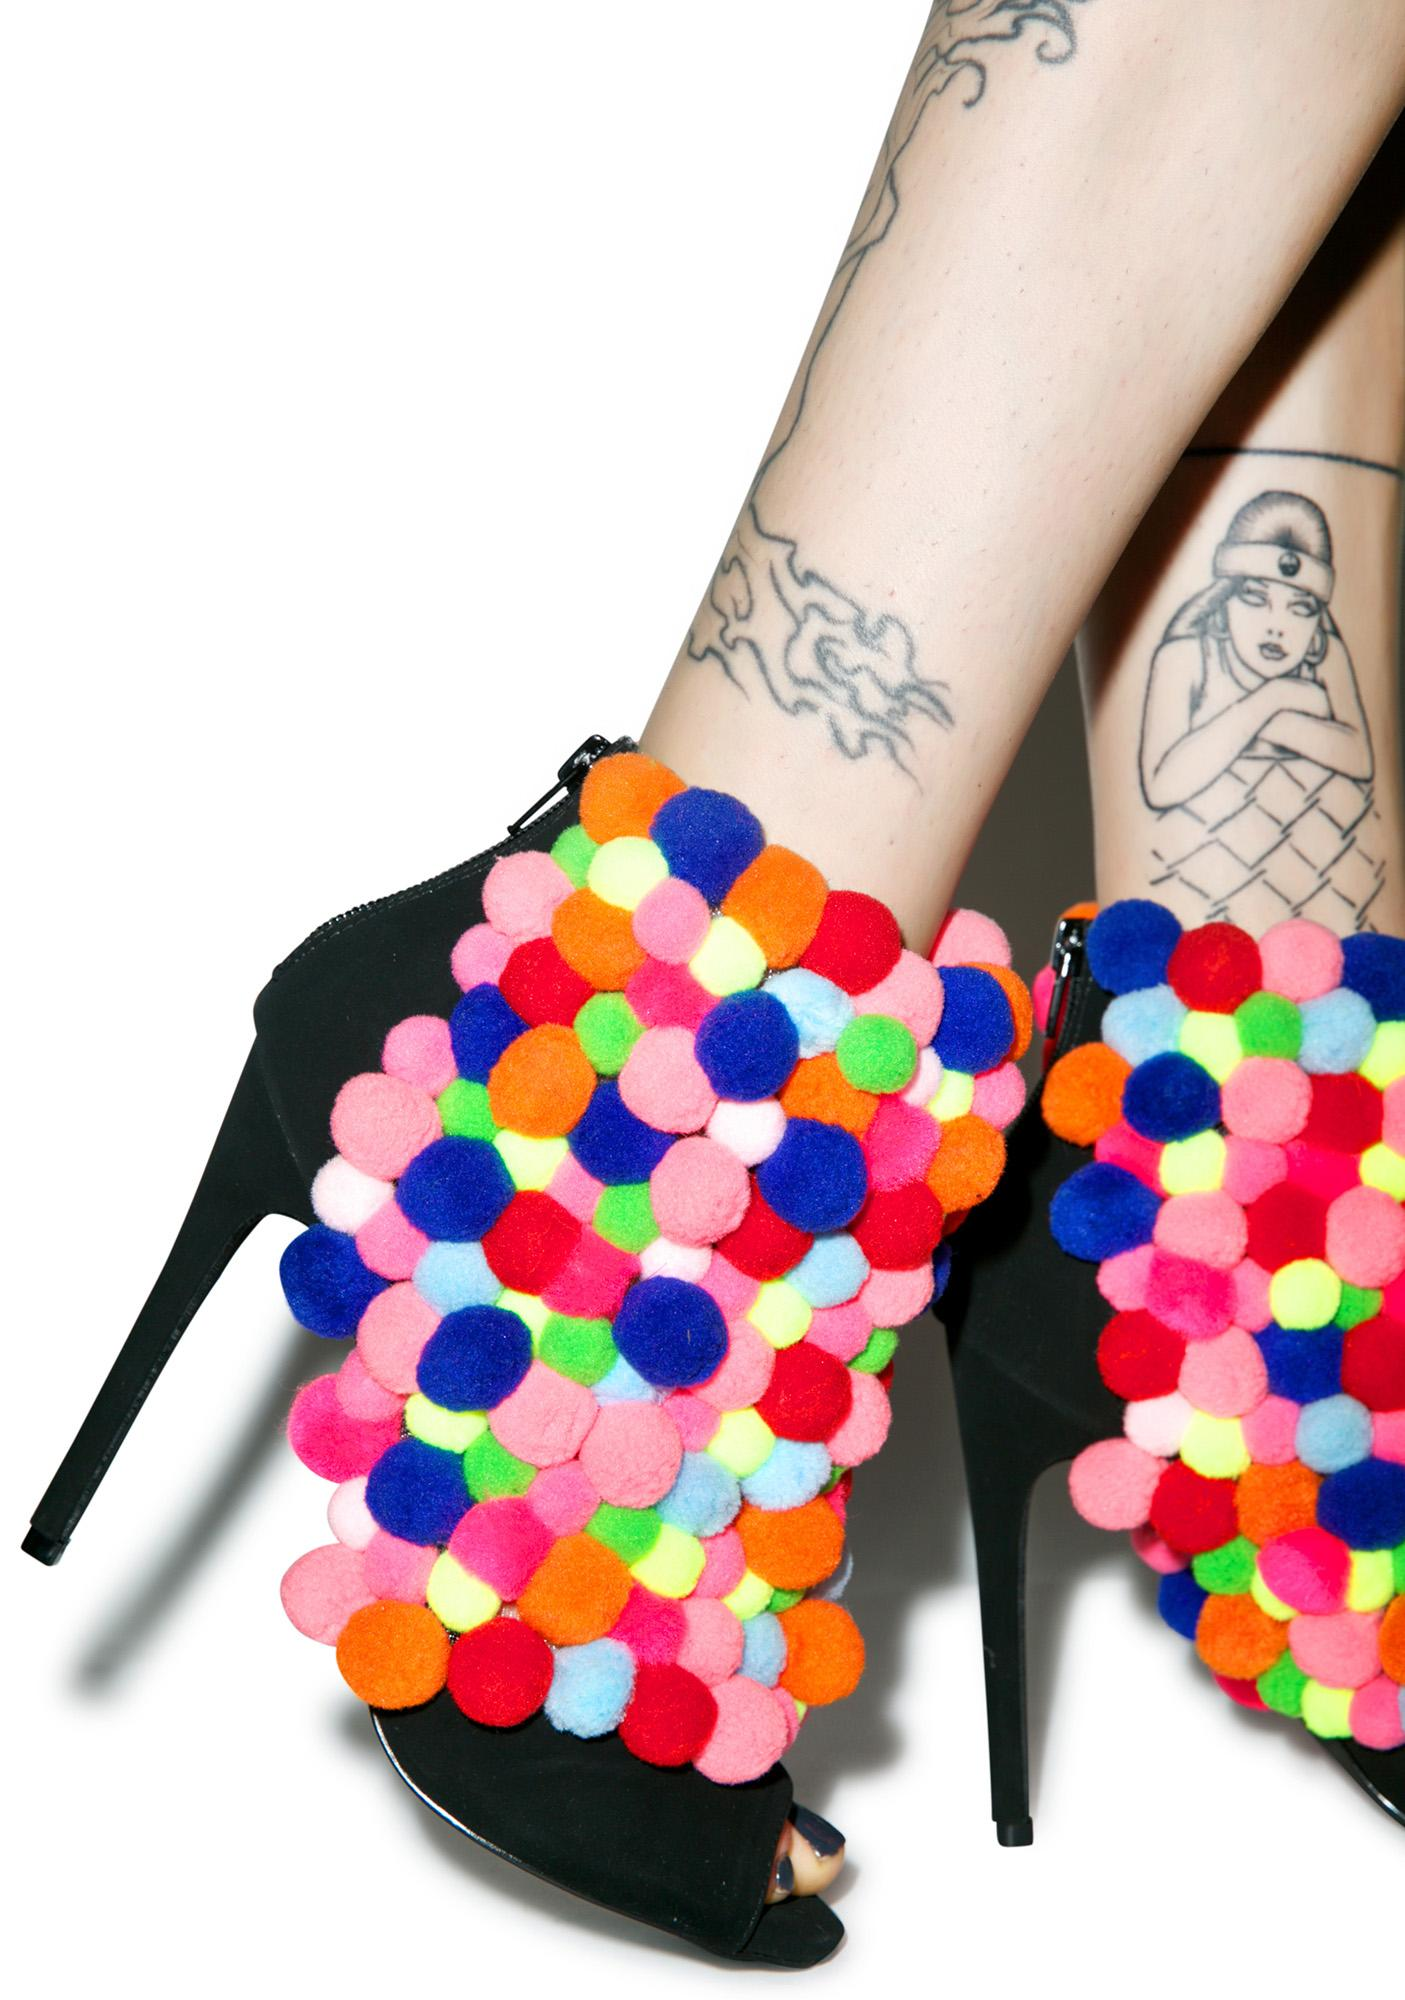 Privileged Rainbow Pom-Pom Ankle Booties